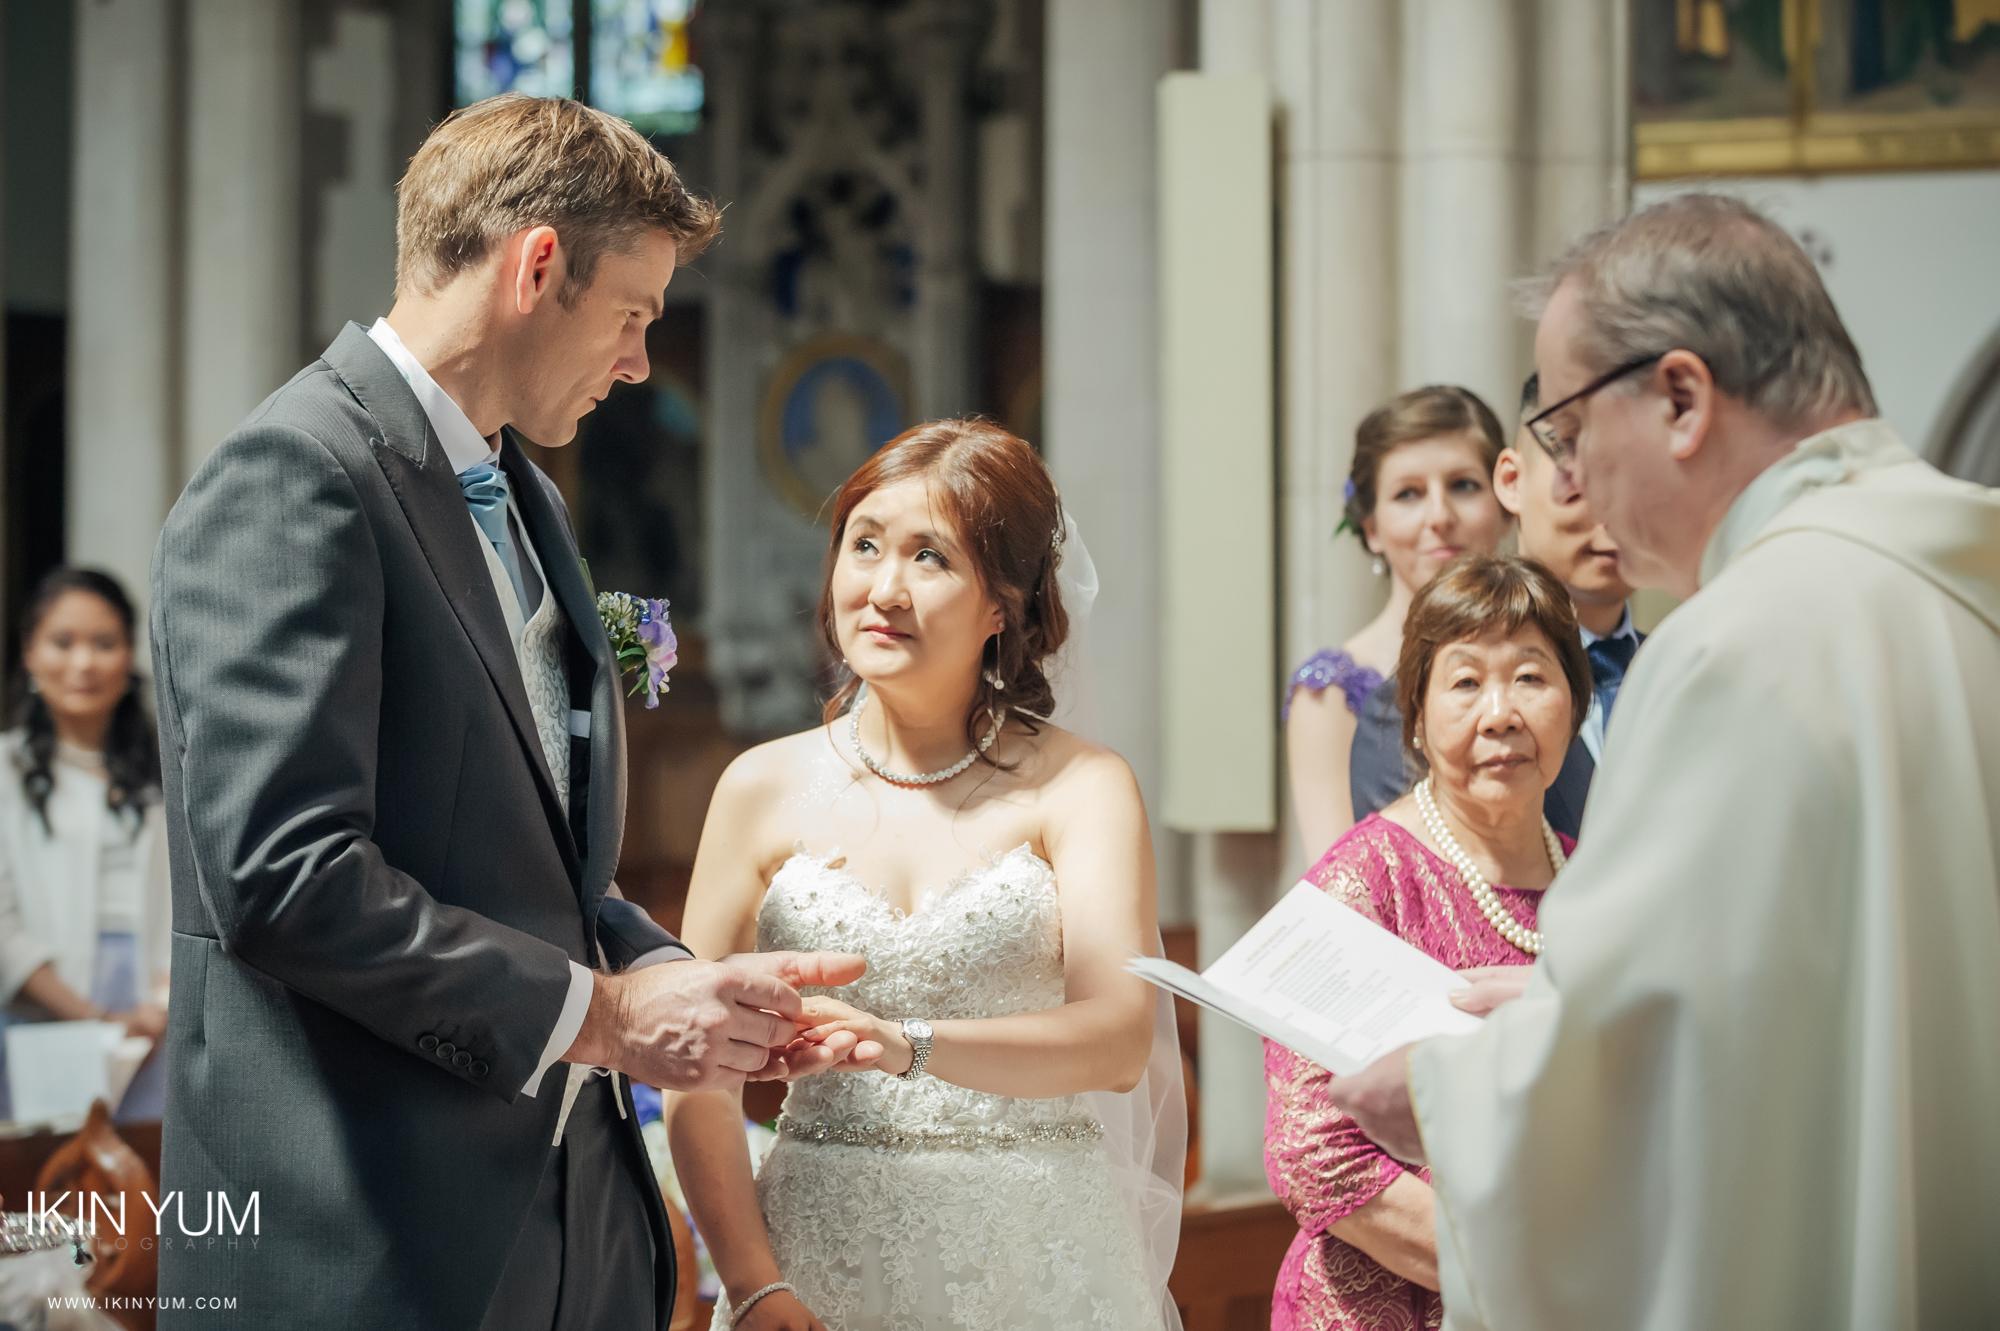 Teresa & Johnathan Weddong Day - The Ceremony-0087.jpg